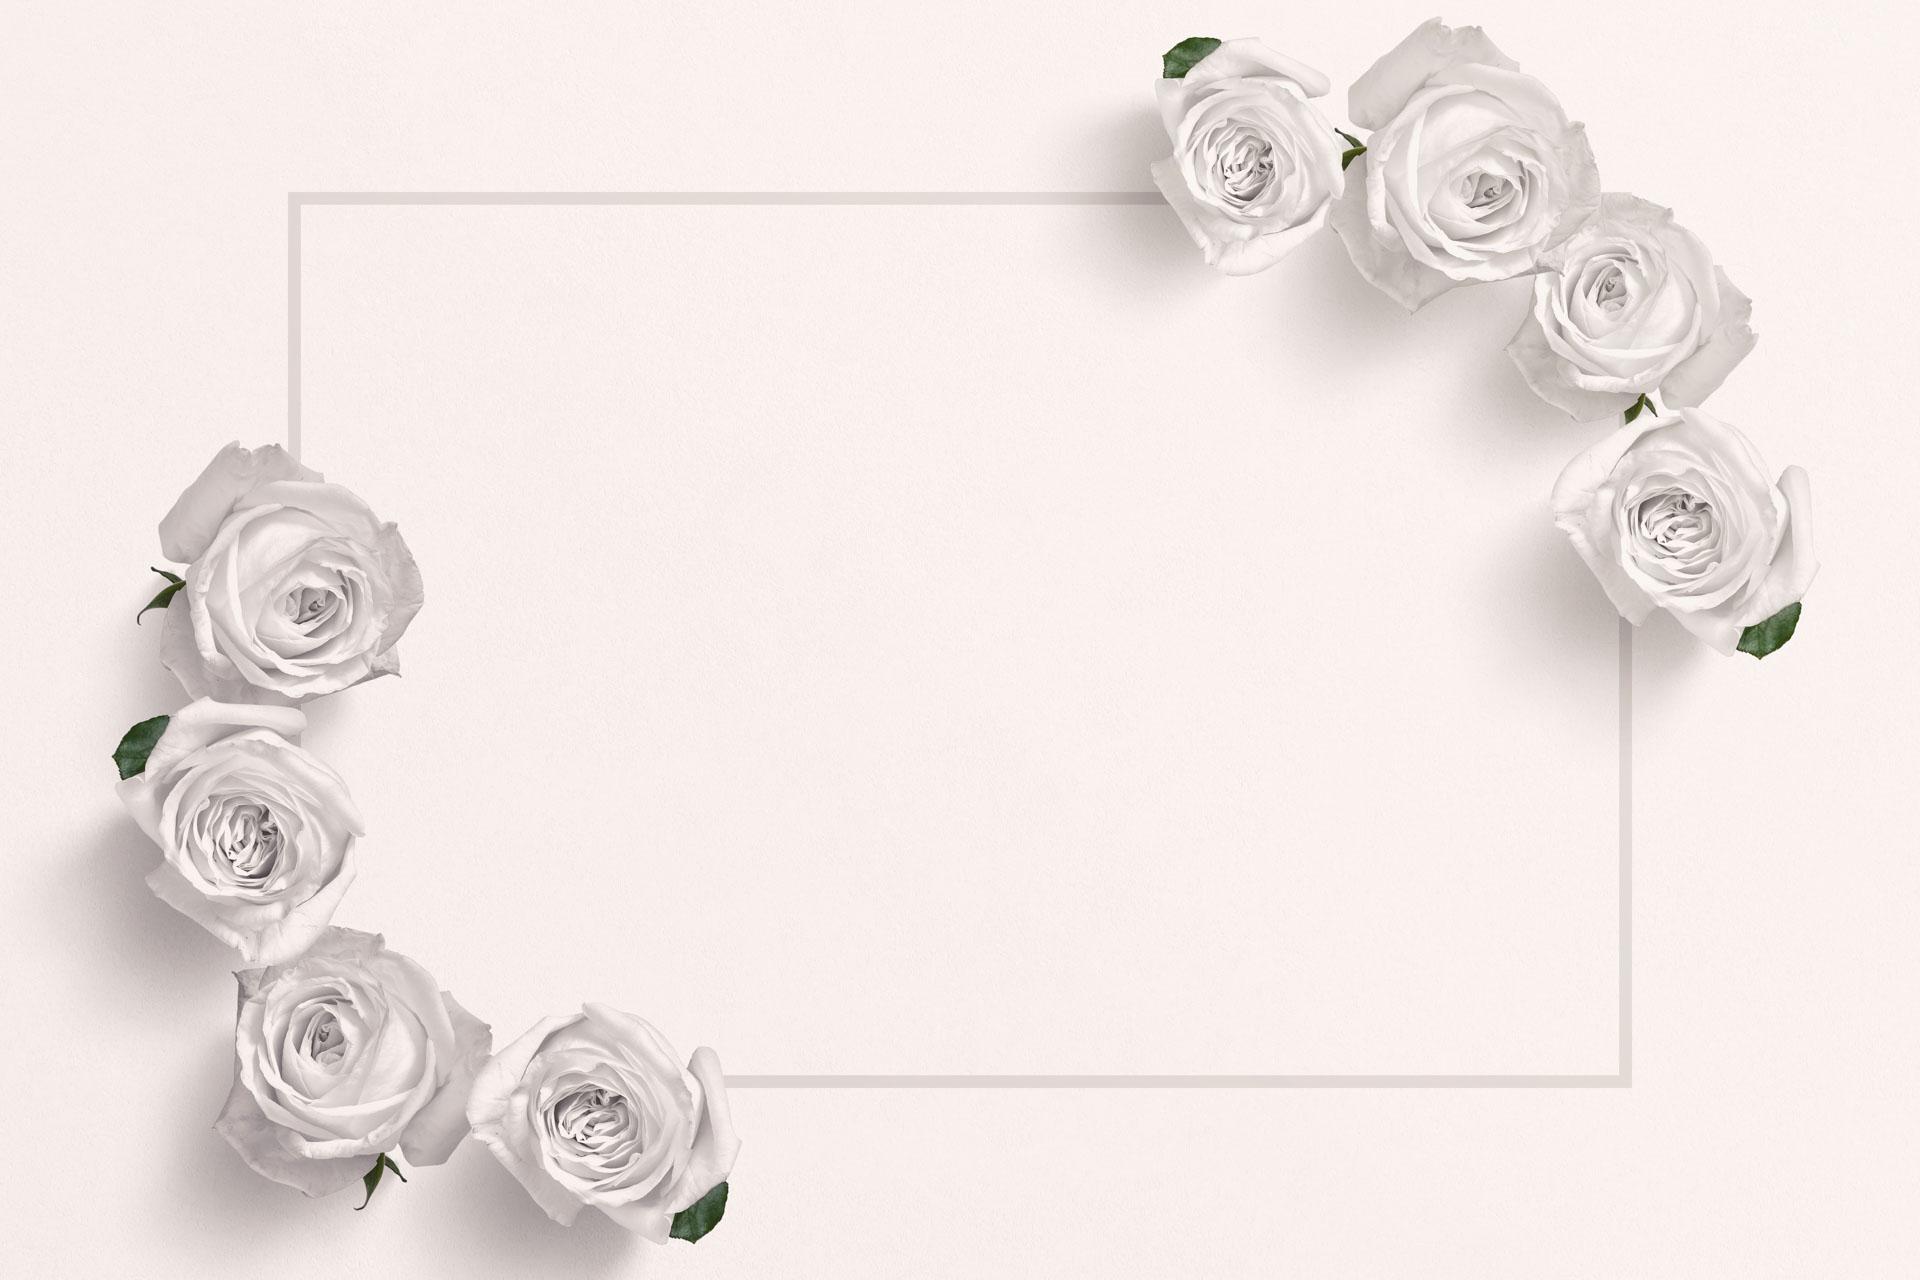 Roses Custom Scene Creator Template 4 Thumbnail 1